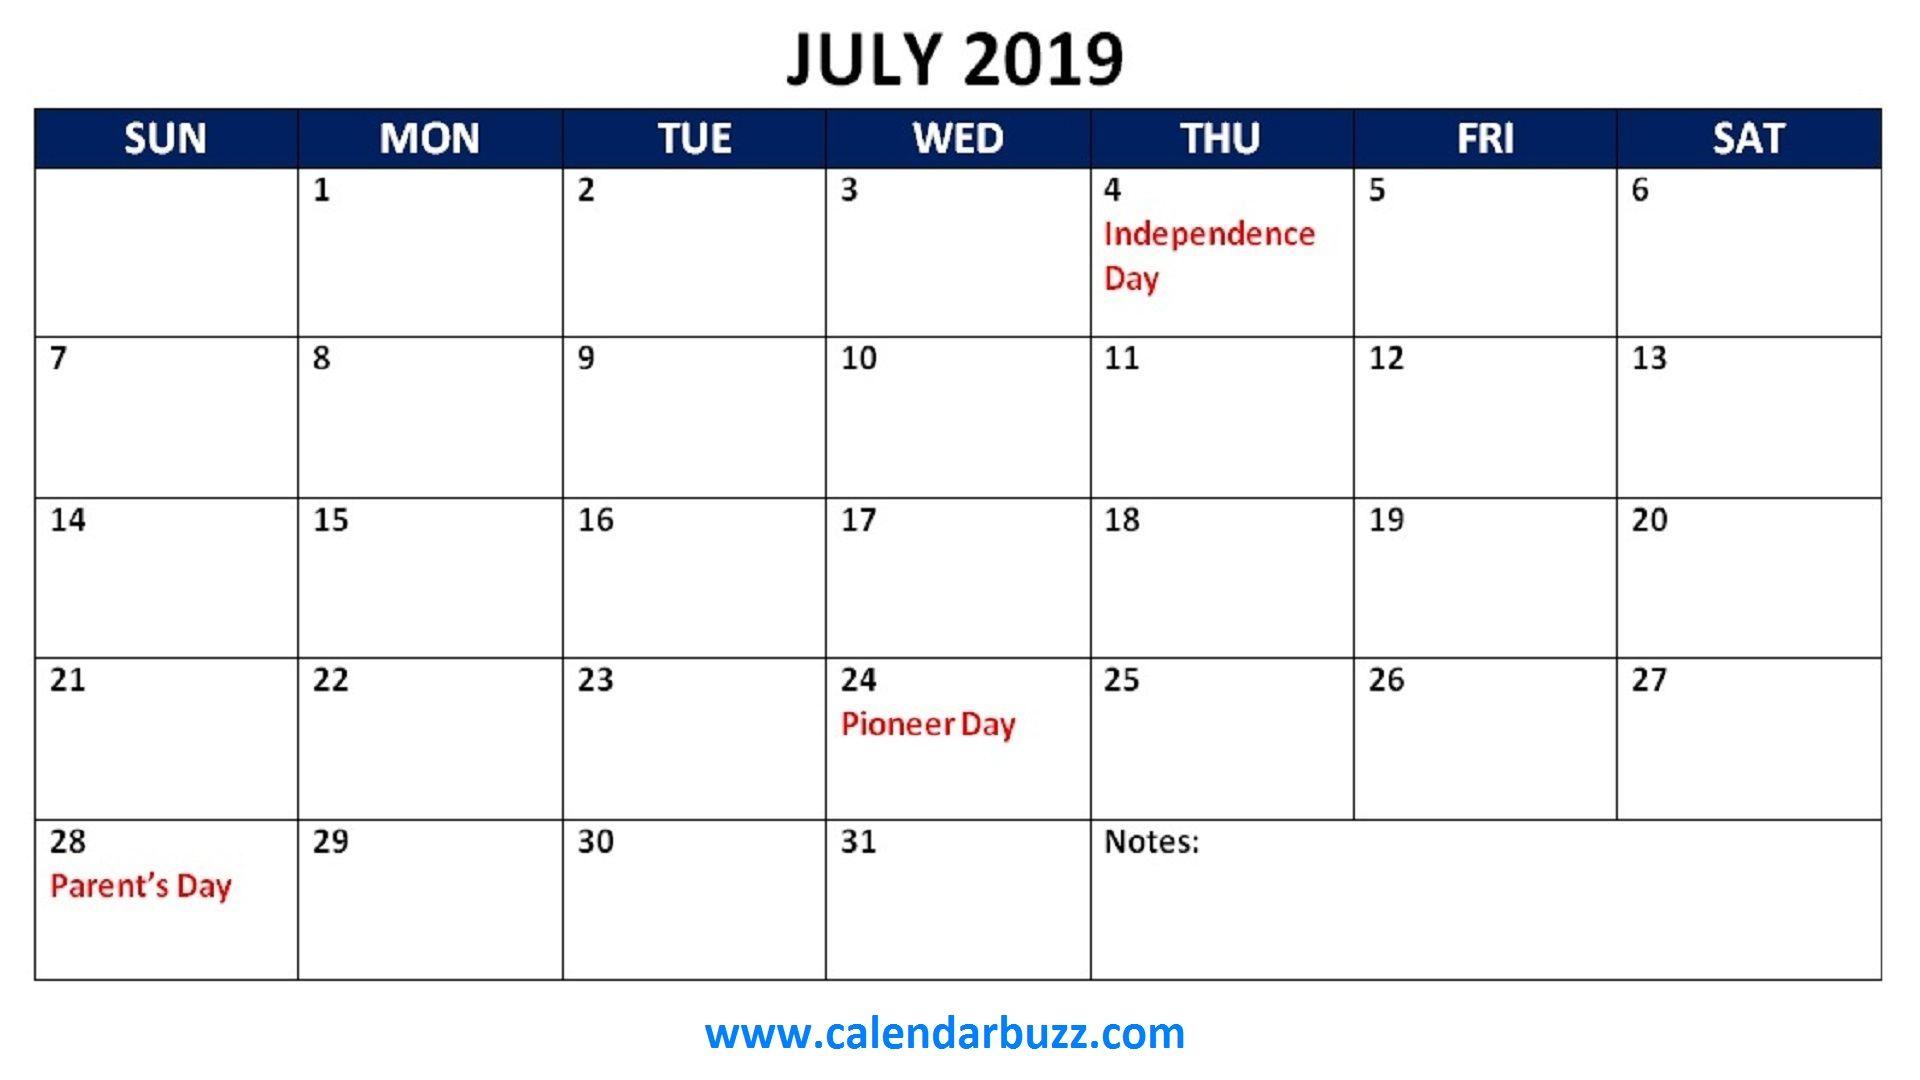 July 2019 Holidays Calendar Printable 2019 Calendars Pinterest